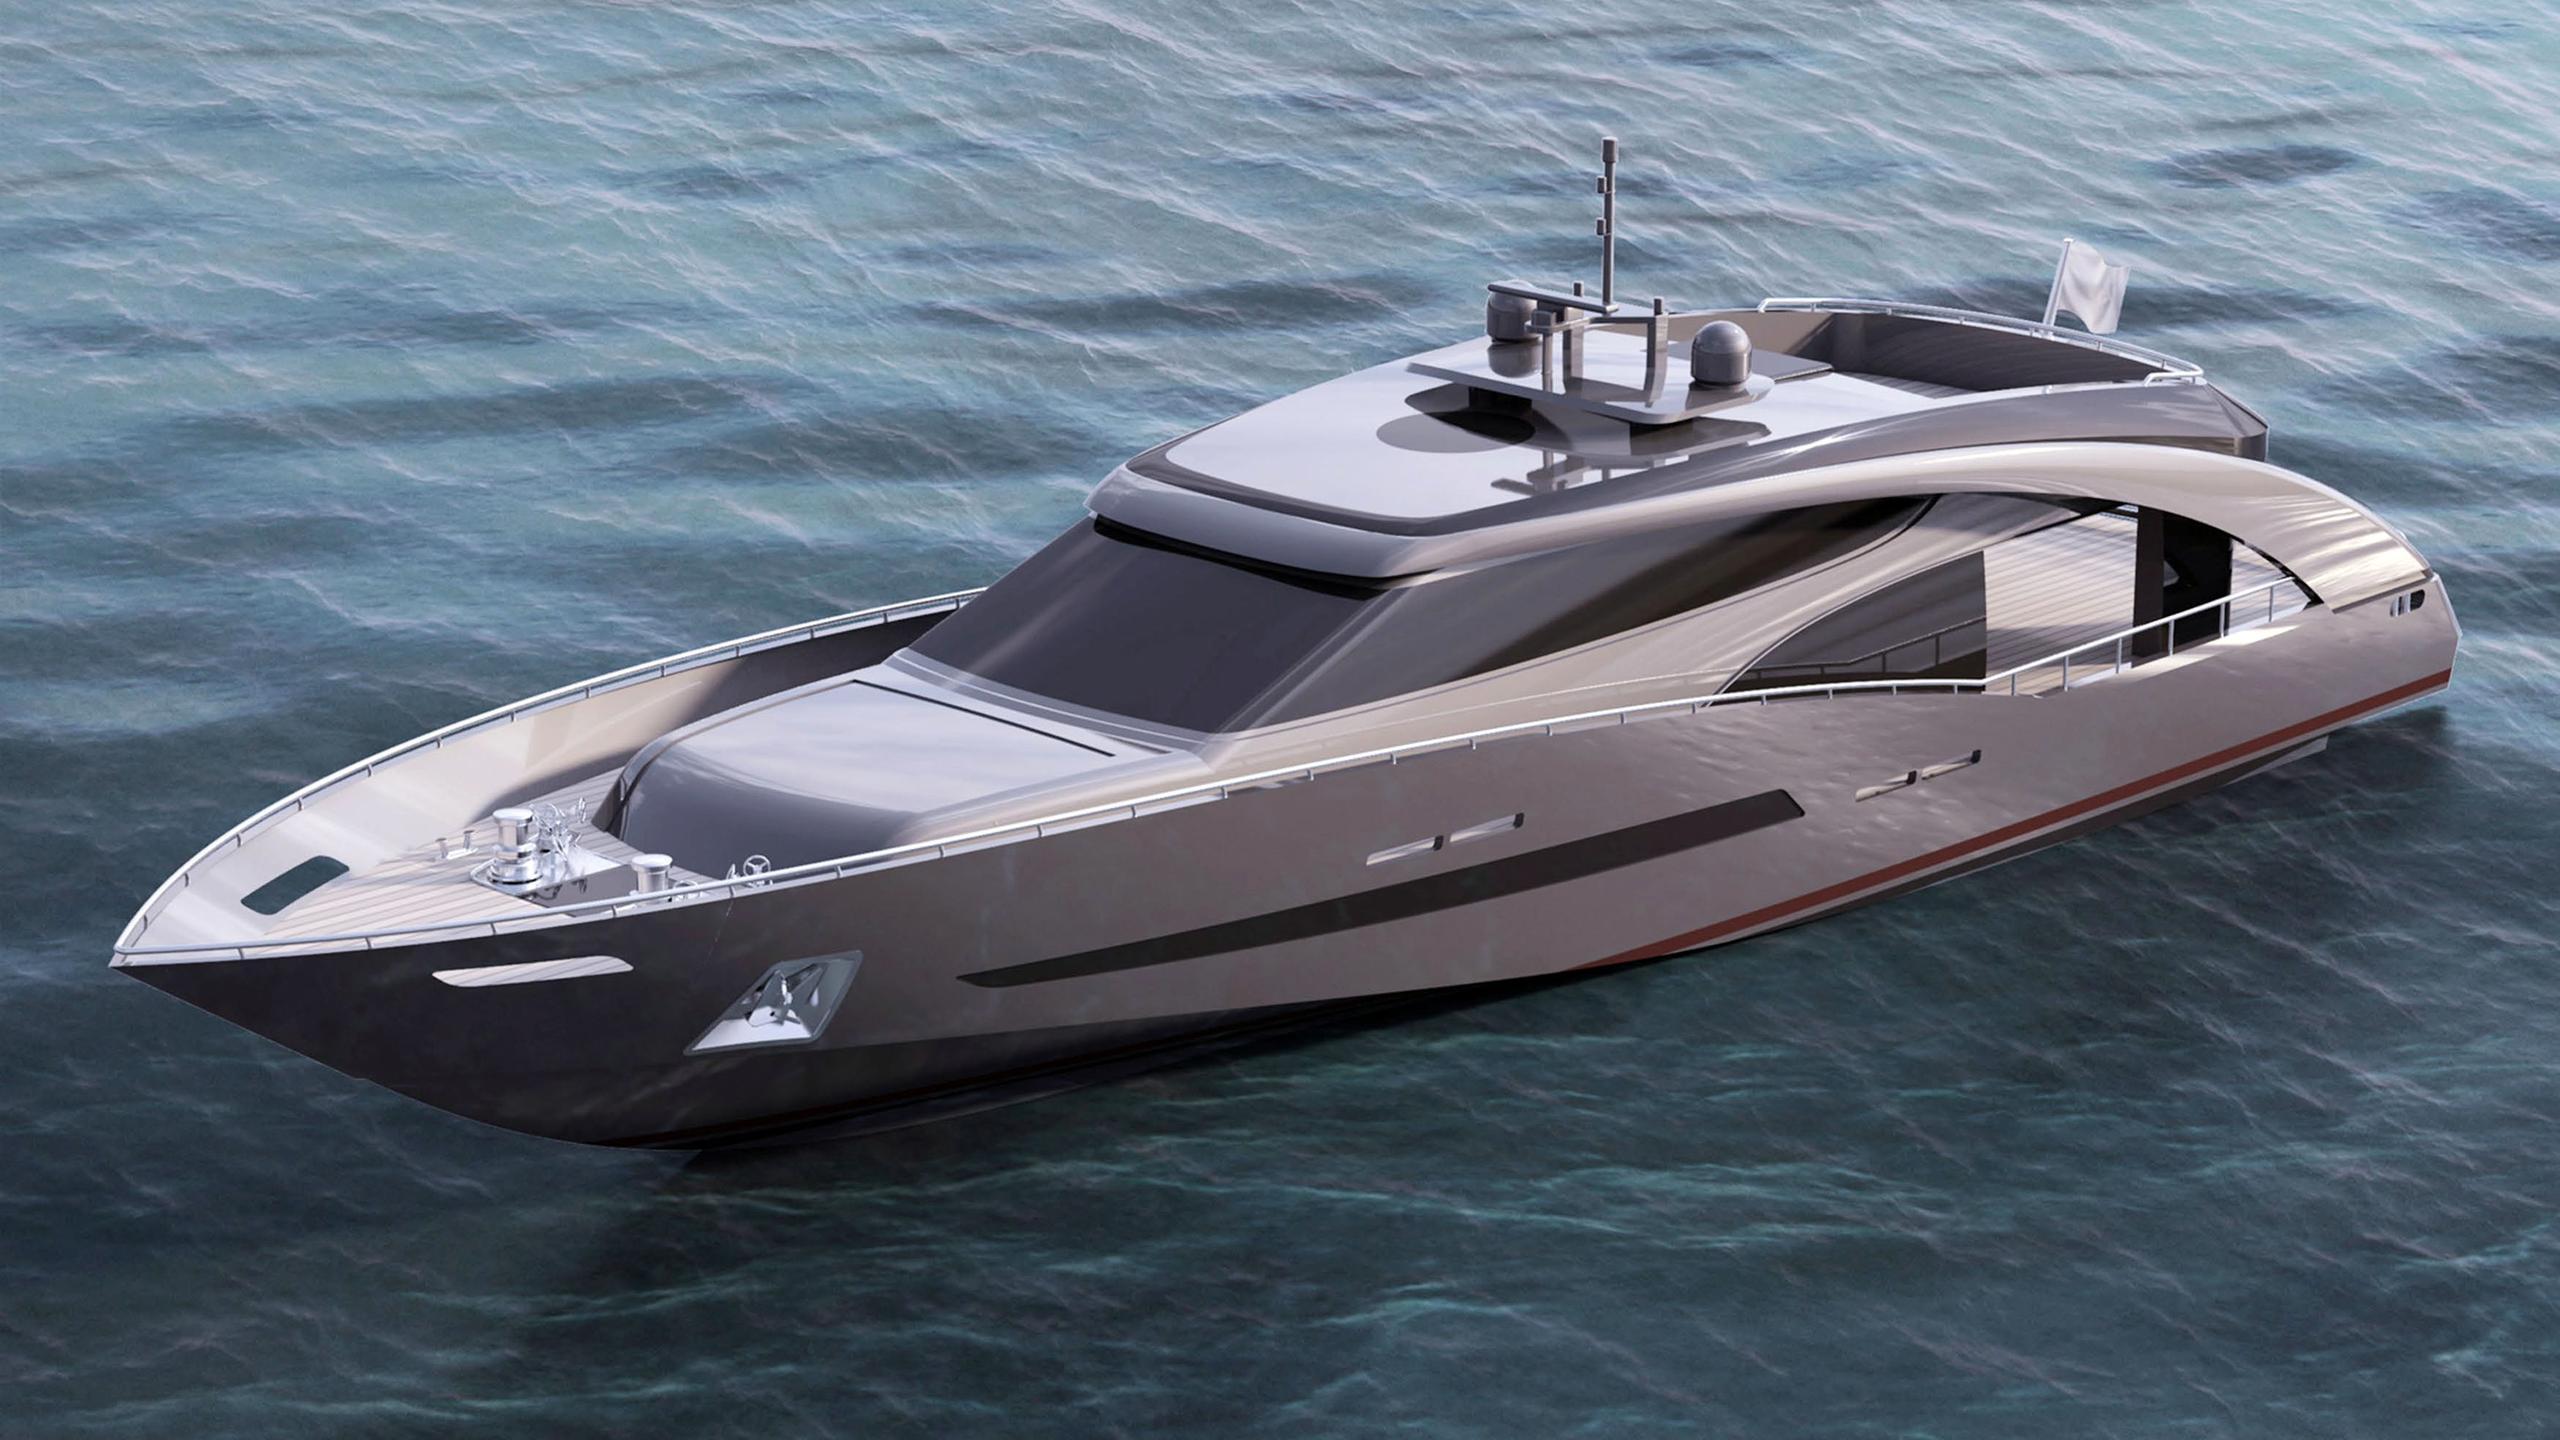 fuoriserie 27m motoryacht ccn 27m 2018 rendering